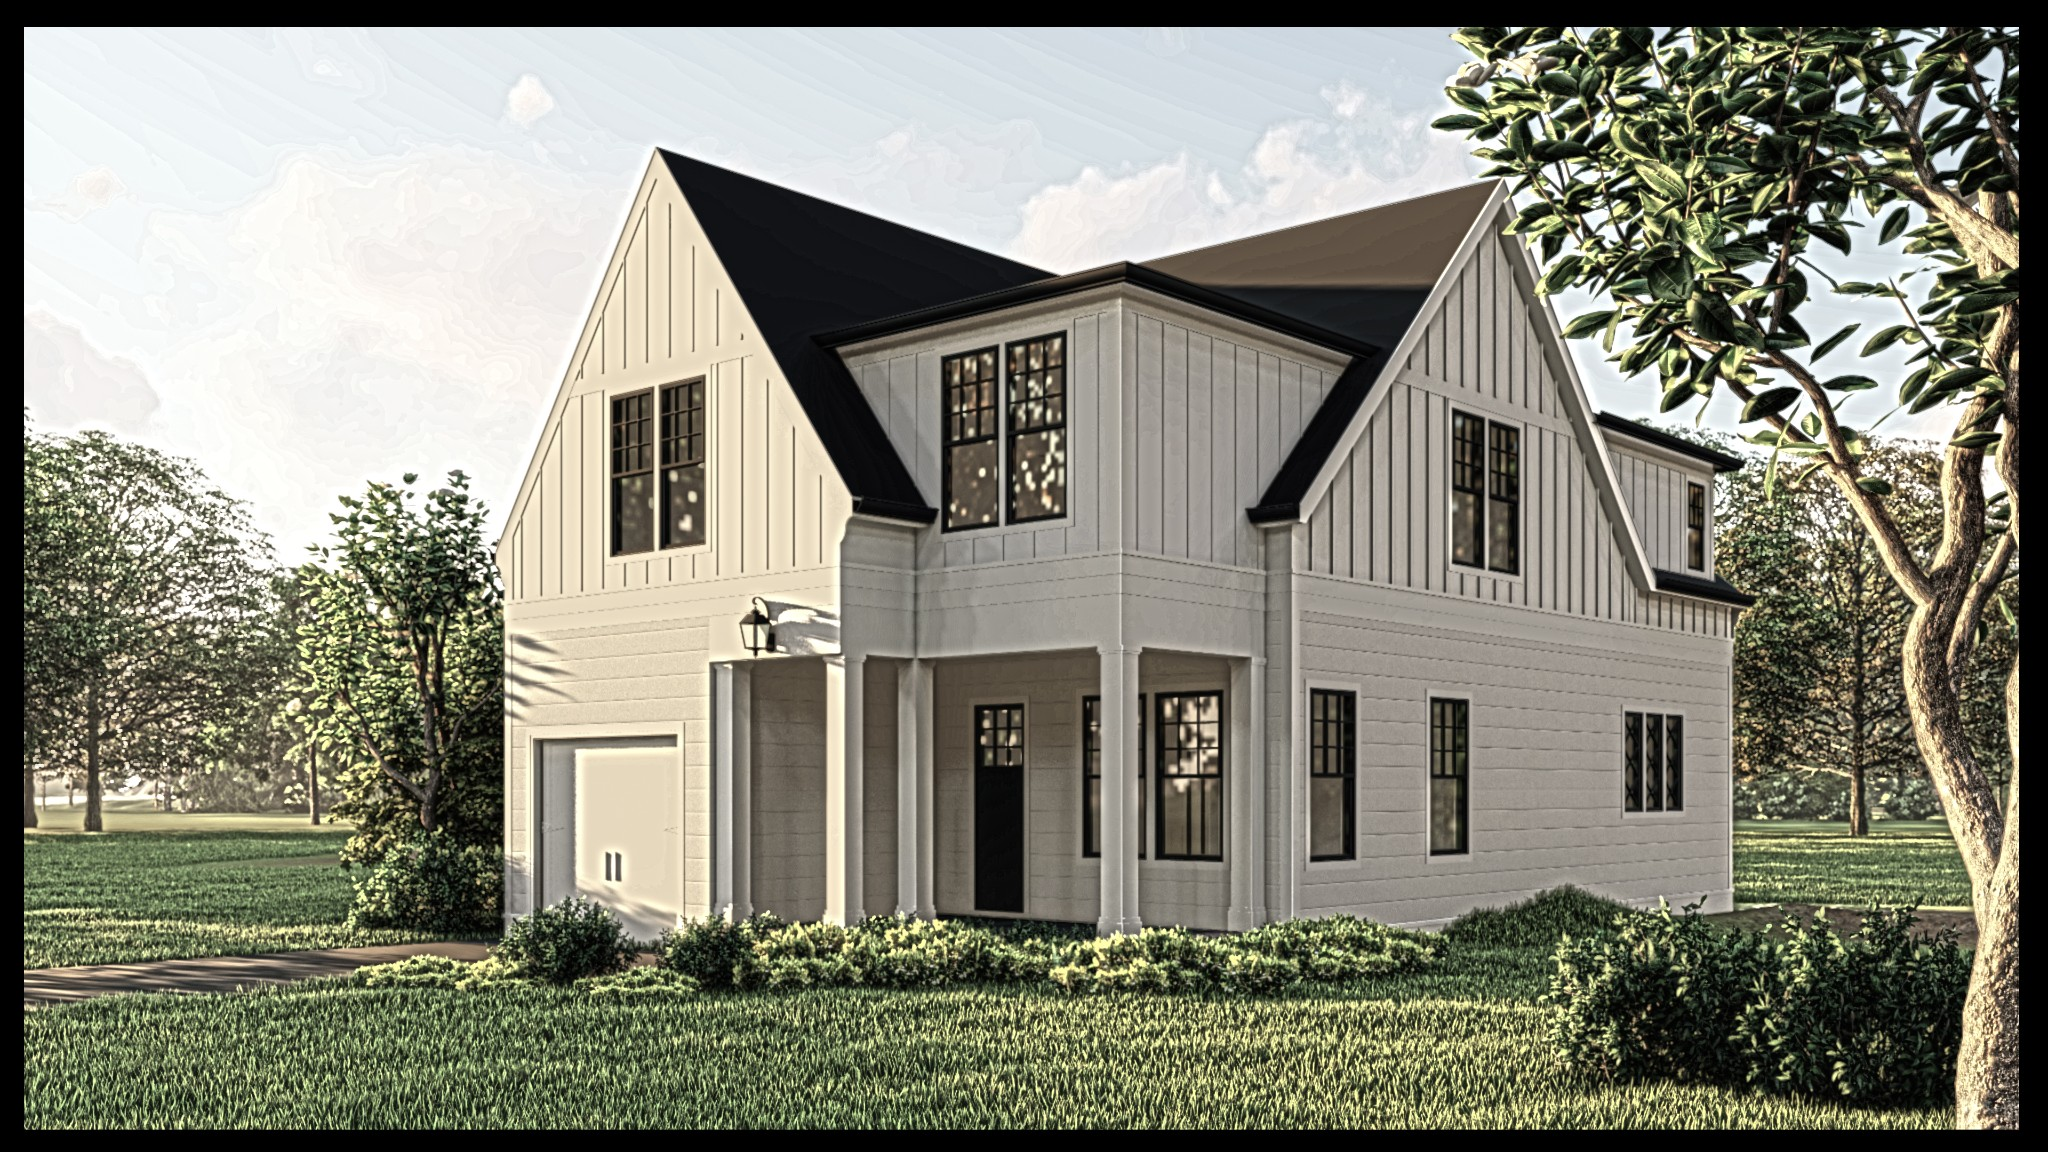 1505 60th Ave N Property Photo - Nashville, TN real estate listing